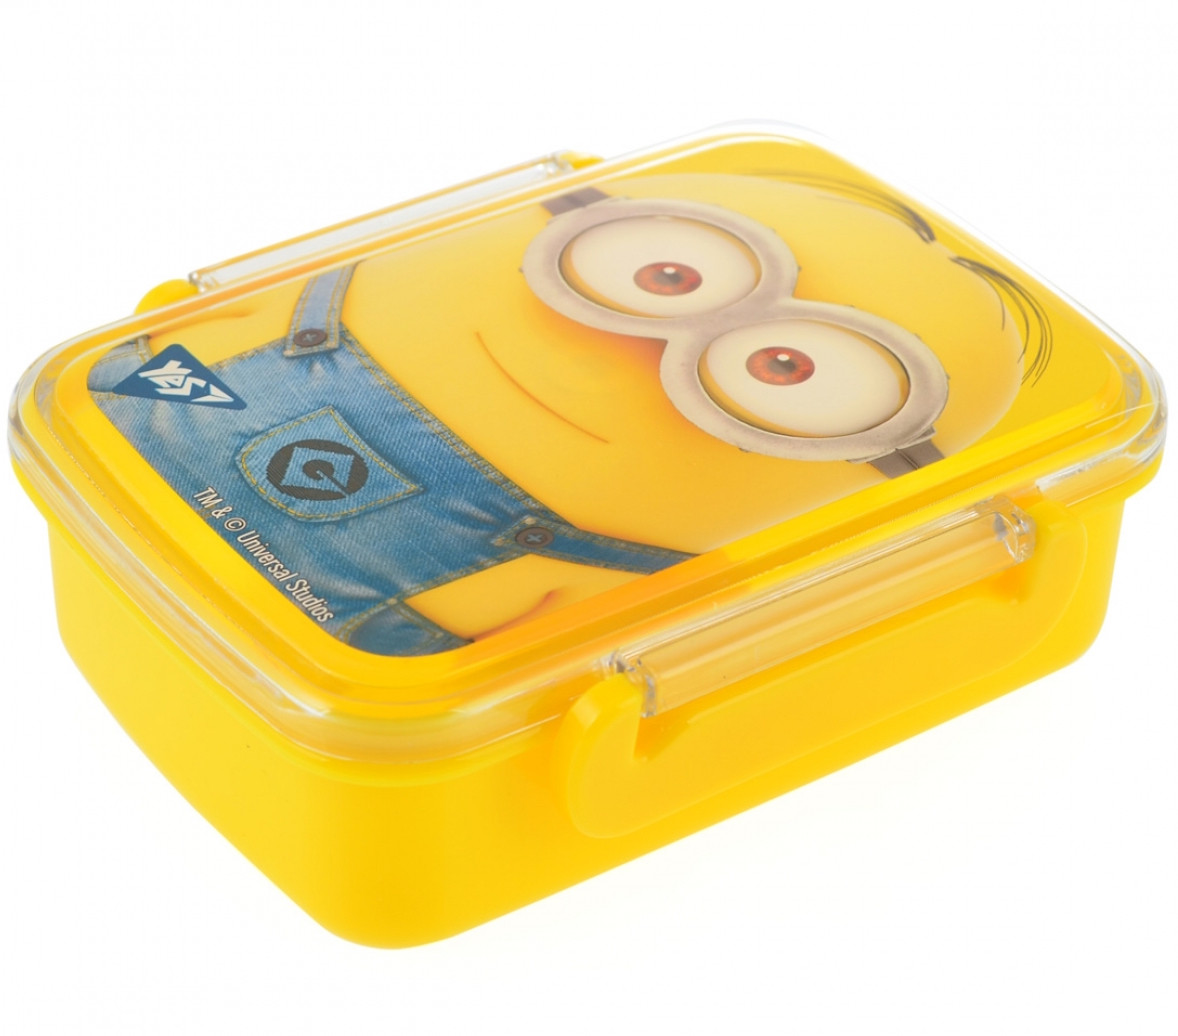 "Контейнер для еды YES ""Minions"" с разделителем 420 мл"